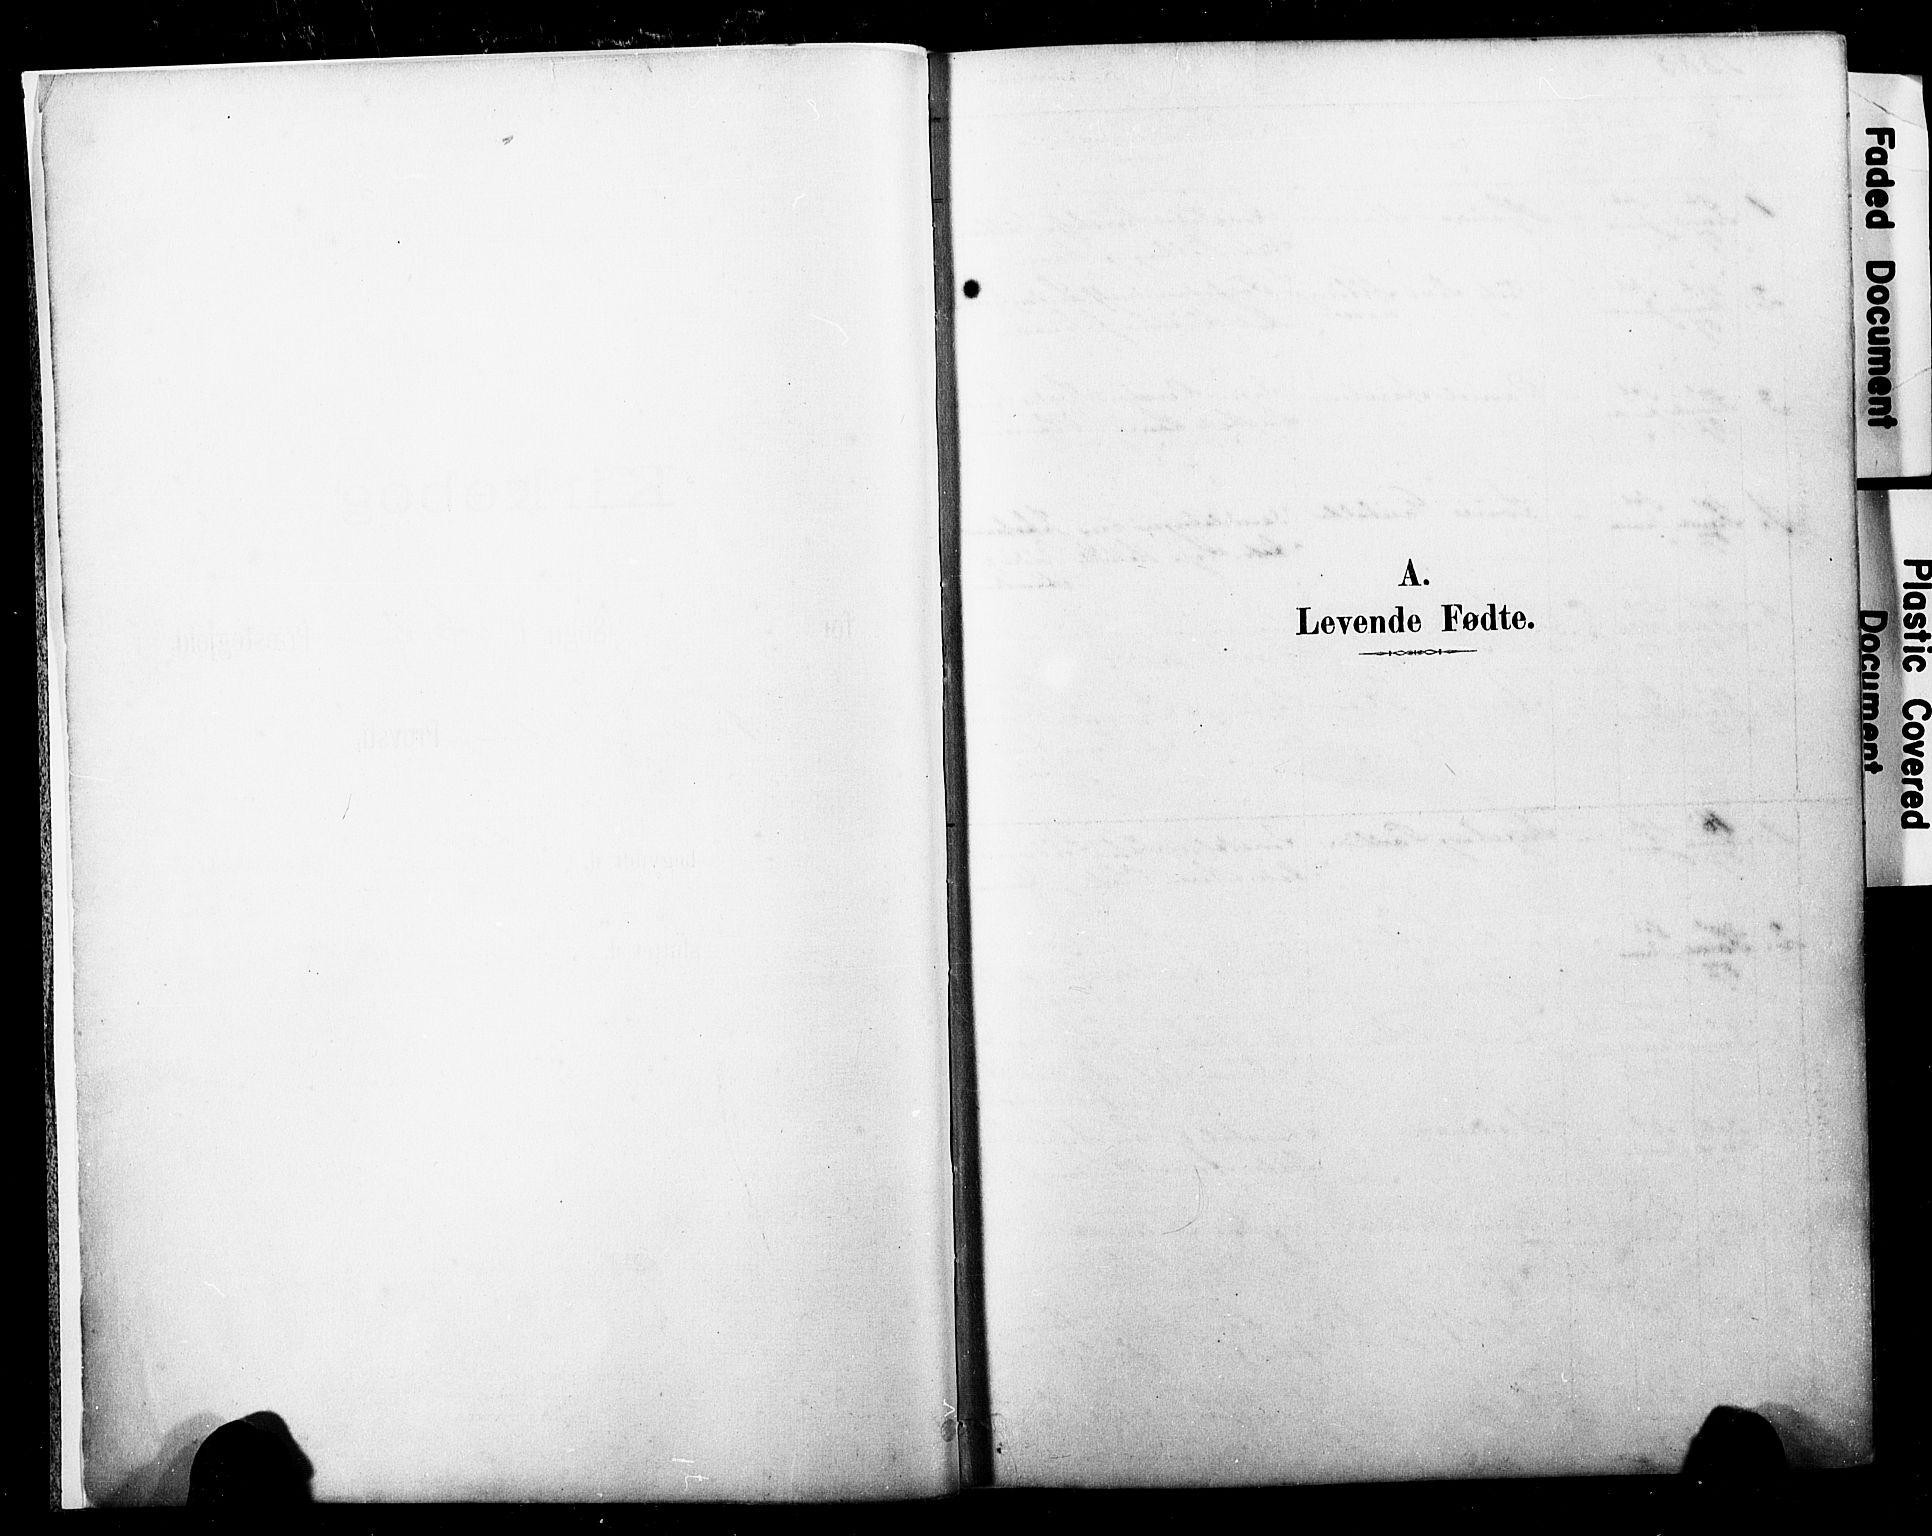 SAKO, Horten kirkebøker, F/Fa/L0004: Parish register (official) no. 4, 1888-1895